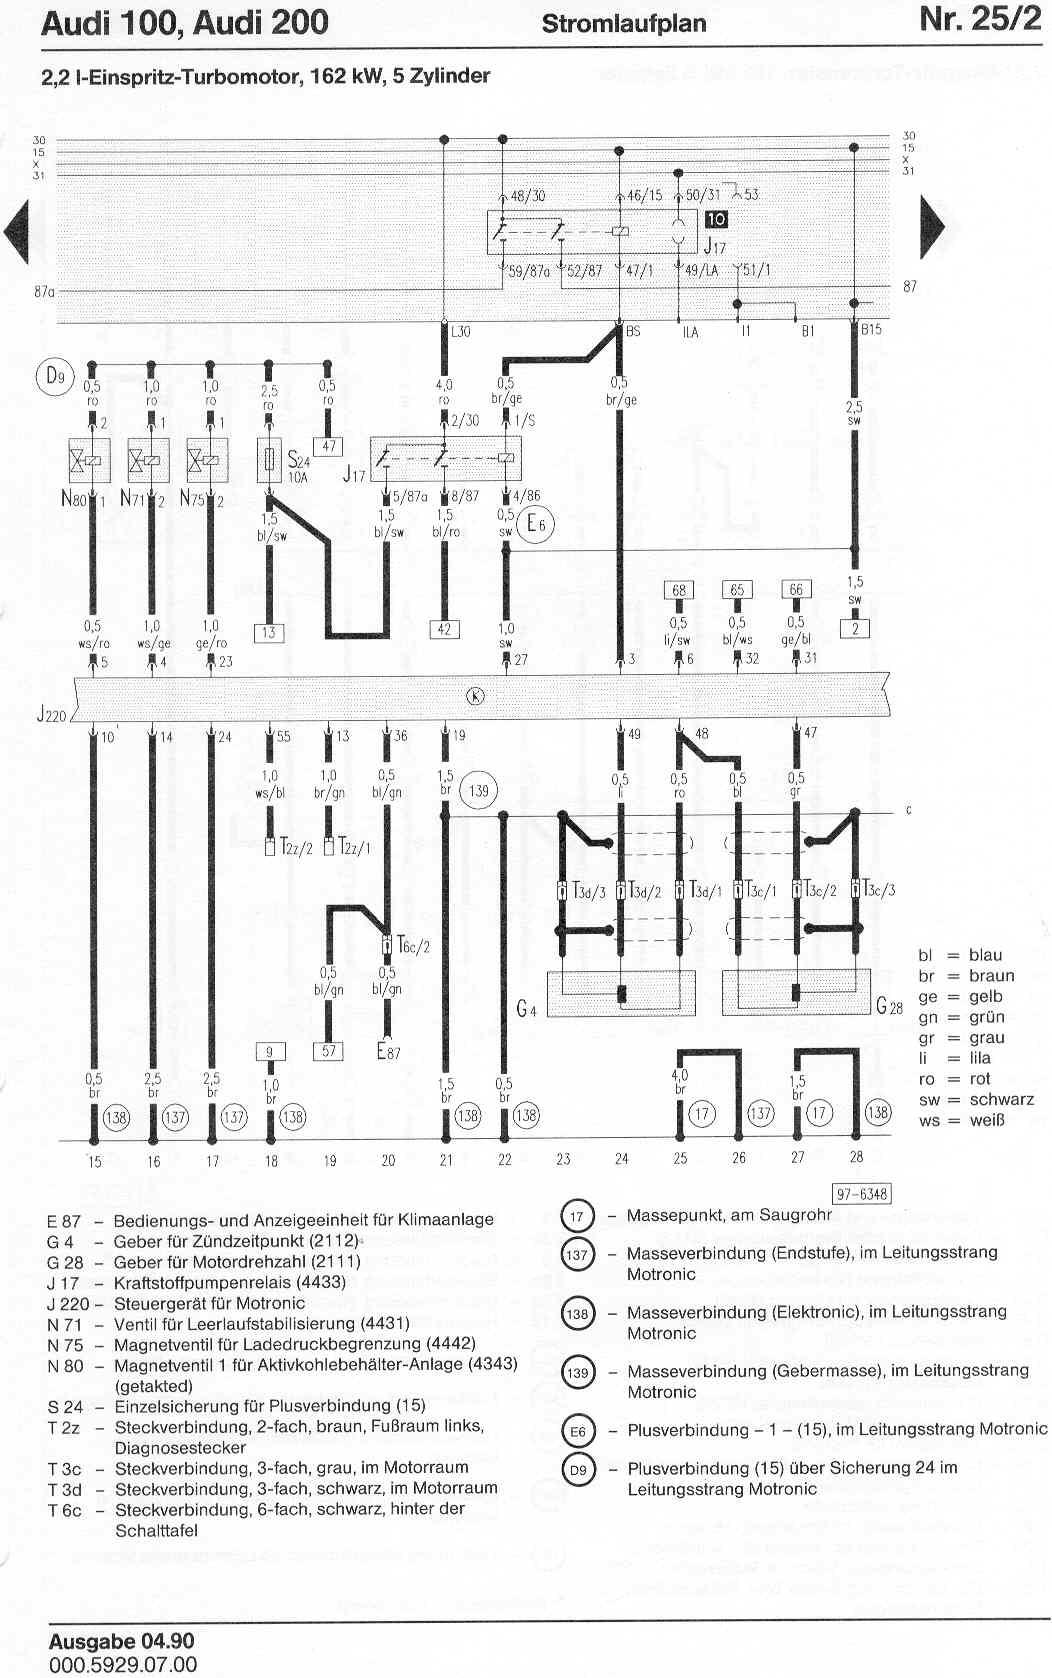 audi 100 c4 wiring diagram headlight switch gm 200 factory diagrams